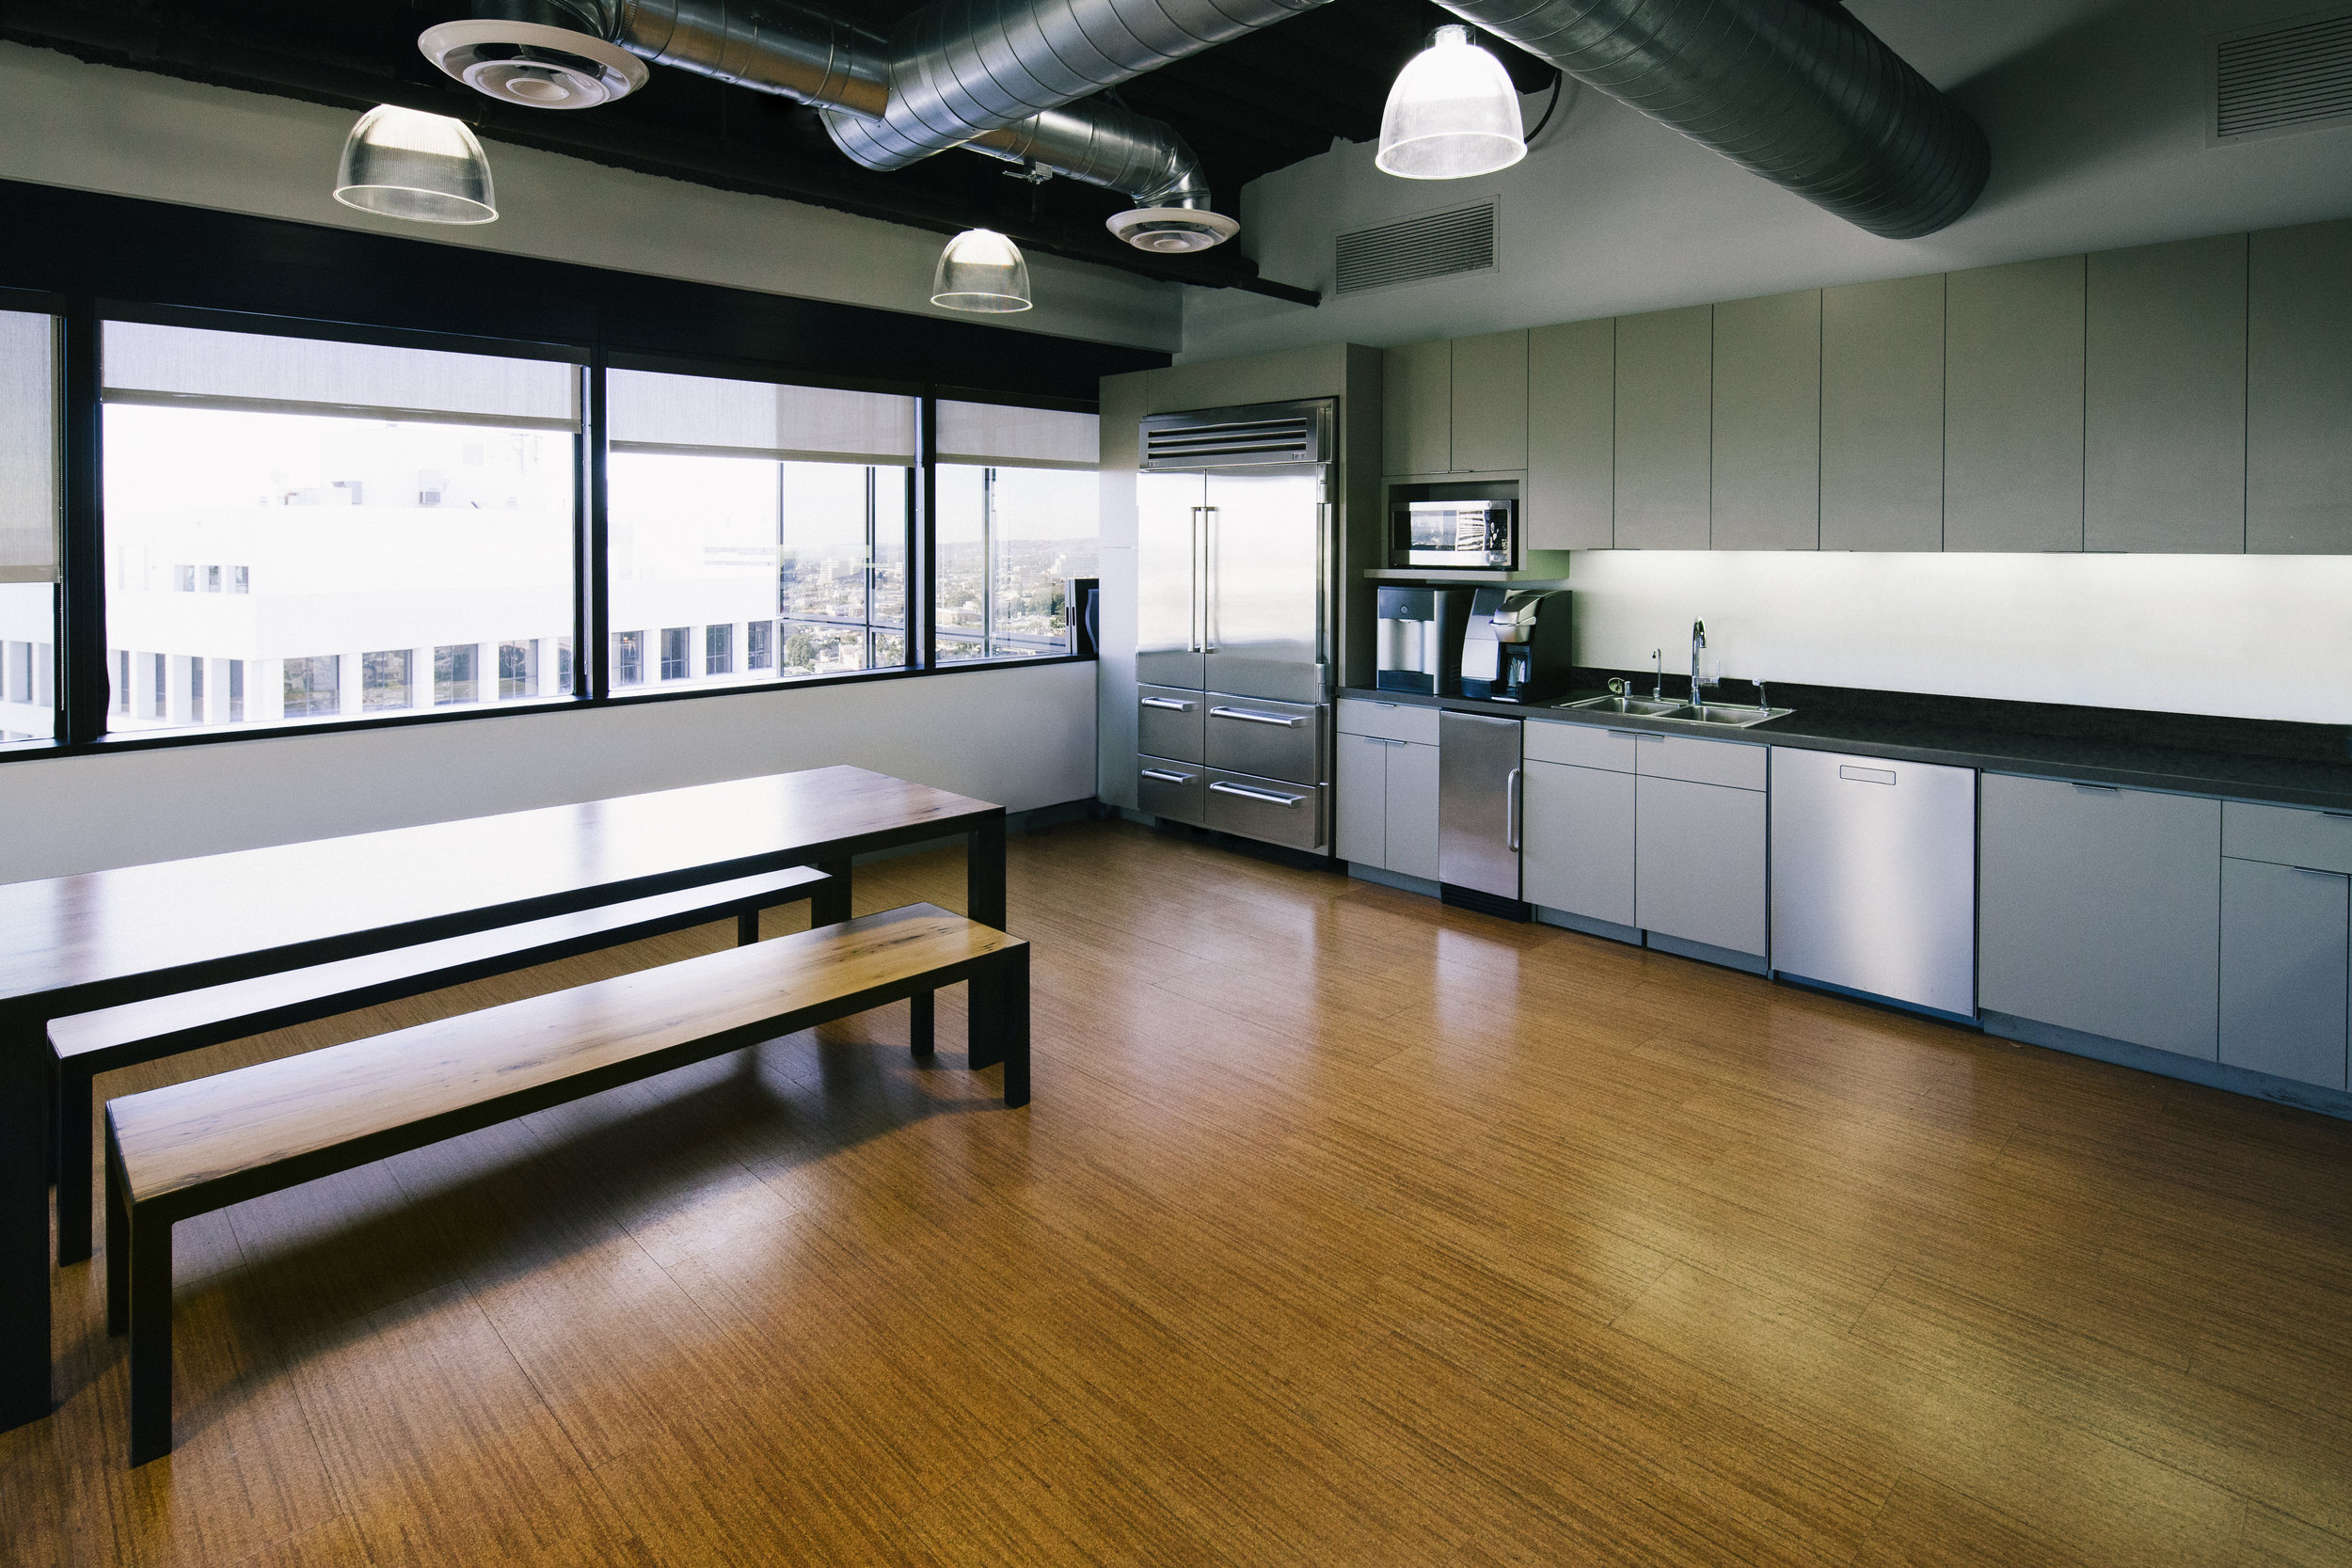 S.E.A.-Studio-Environmental-Architecture-David-Hertz-FAIA-First-Pacific-Advisors-Los-Angeles-tenant-improvement-sustainable-regenerative-restorative-green-design-office-sleek-modern-interior-Westside-commercial-building-professional-workplace-9.jpg